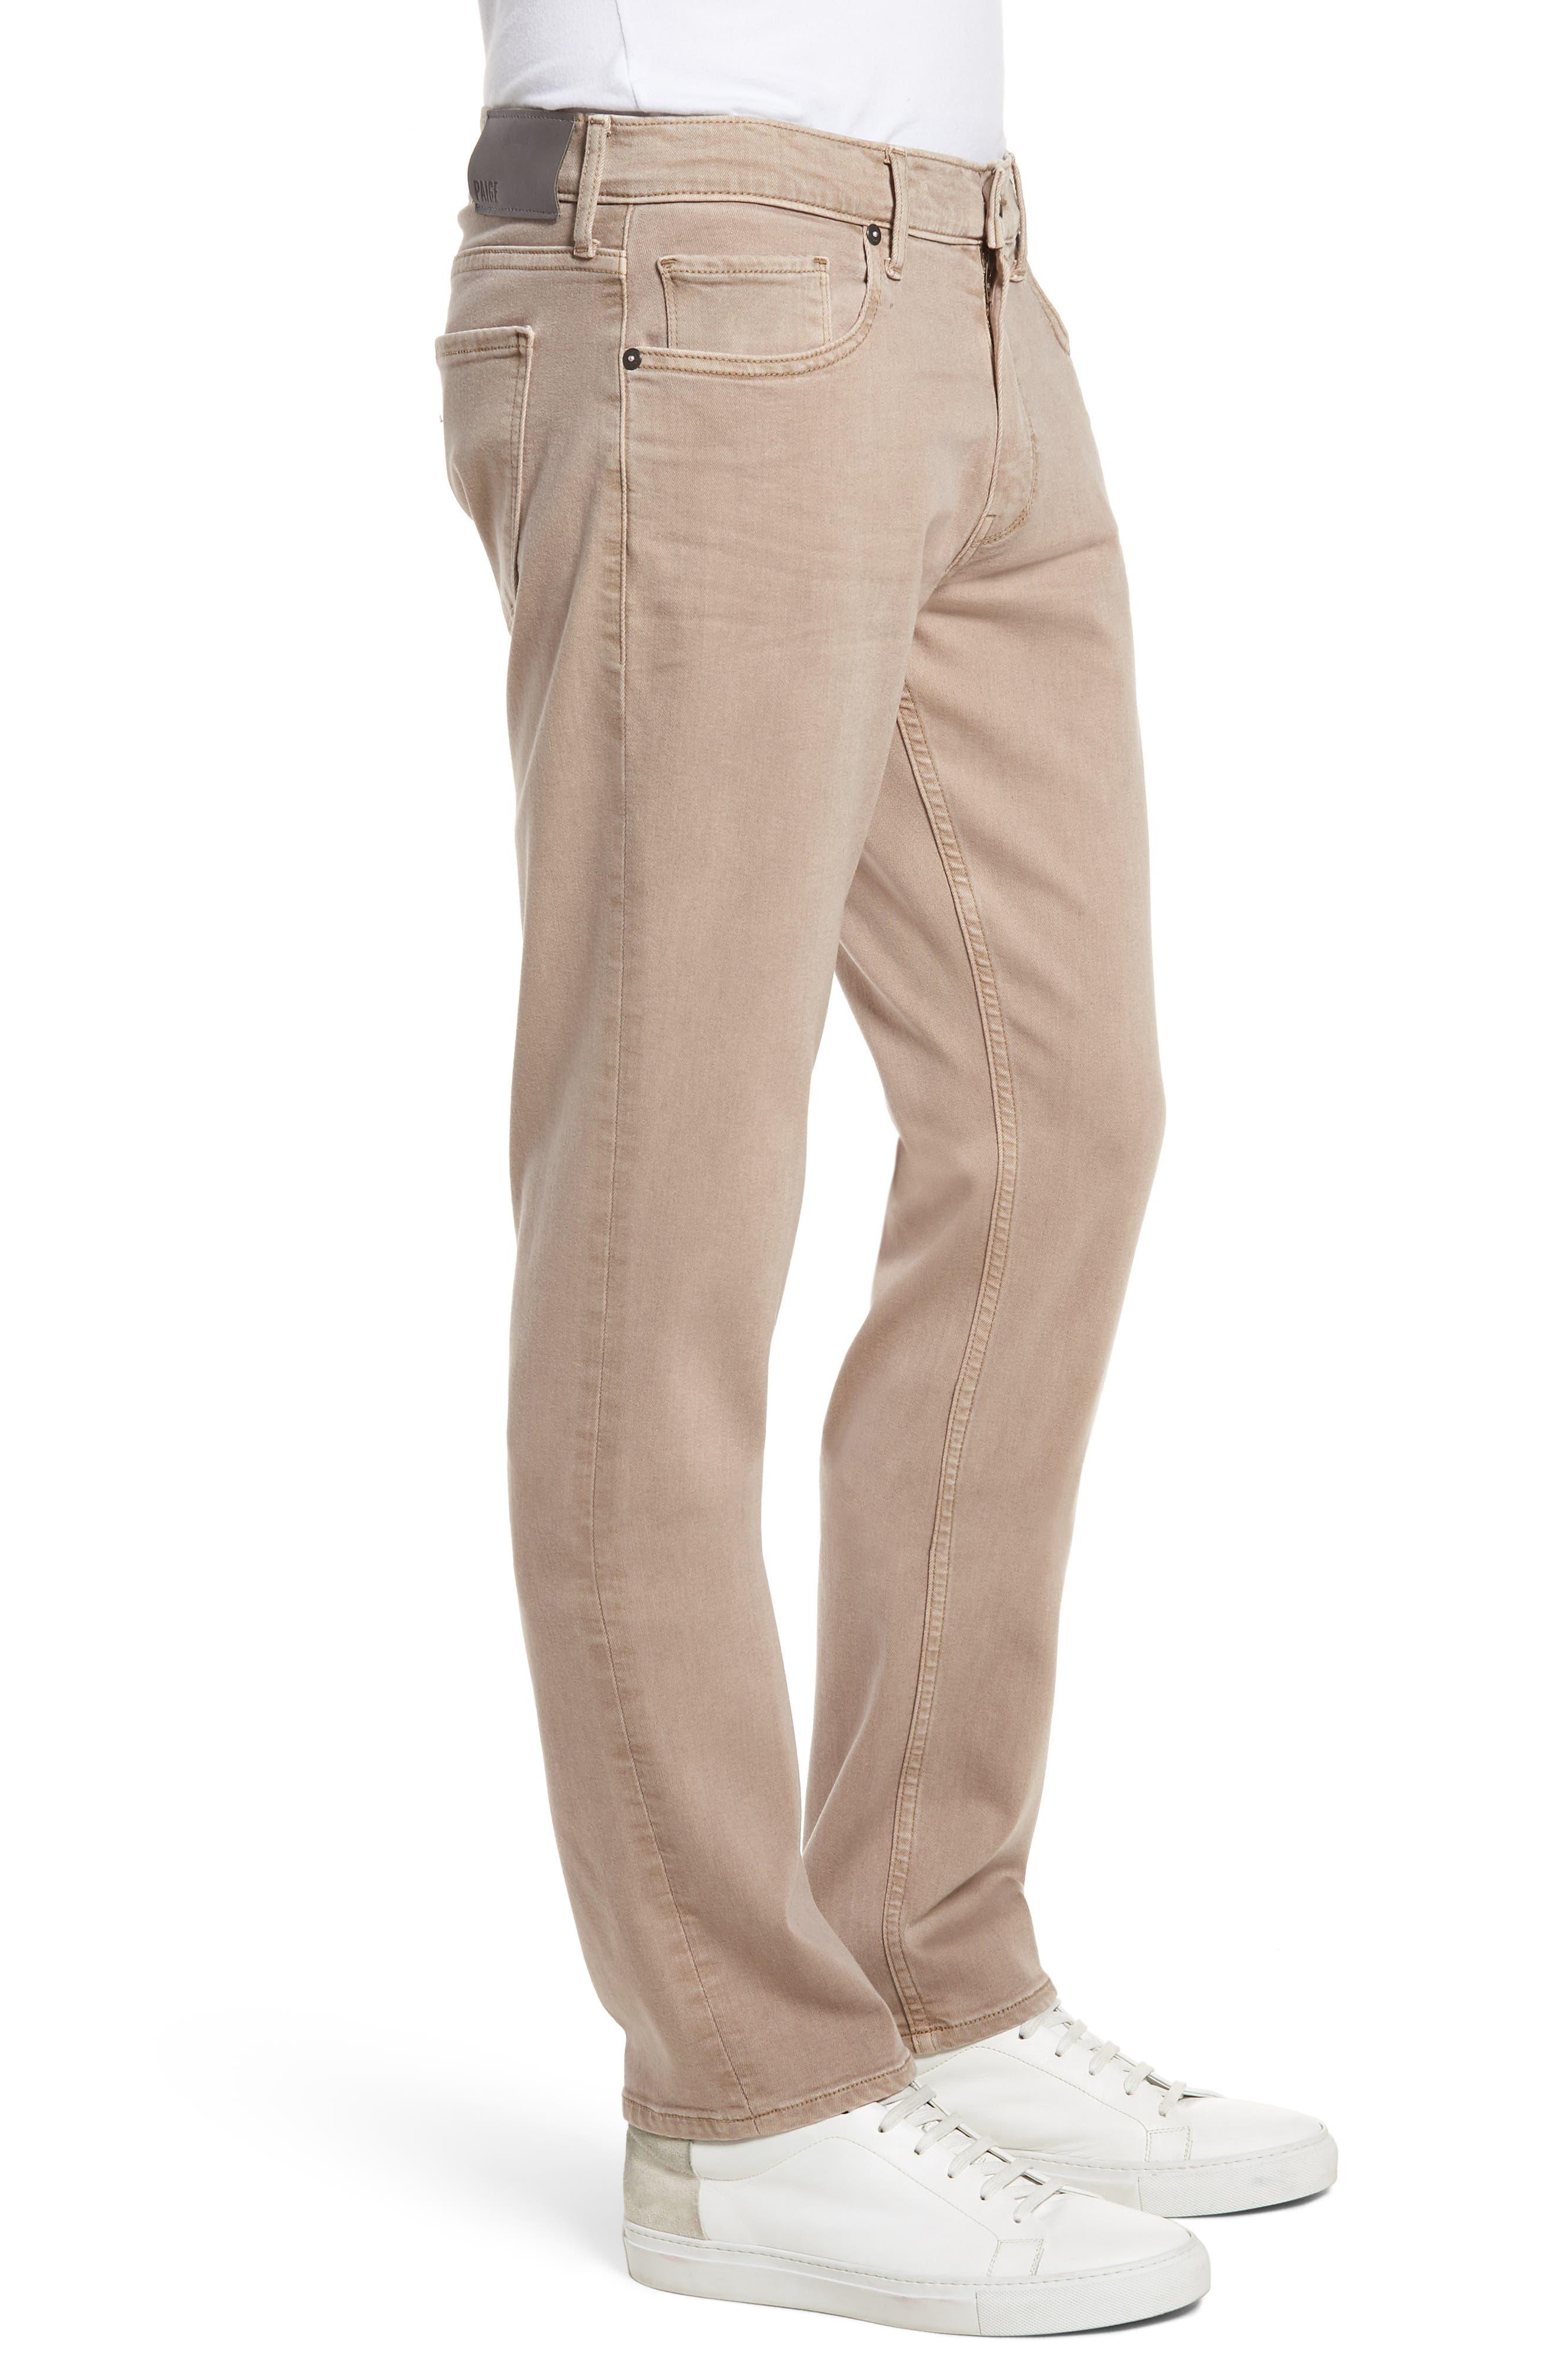 PAIGE,                             Federal Slim Straight Leg Jeans,                             Alternate thumbnail 3, color,                             250